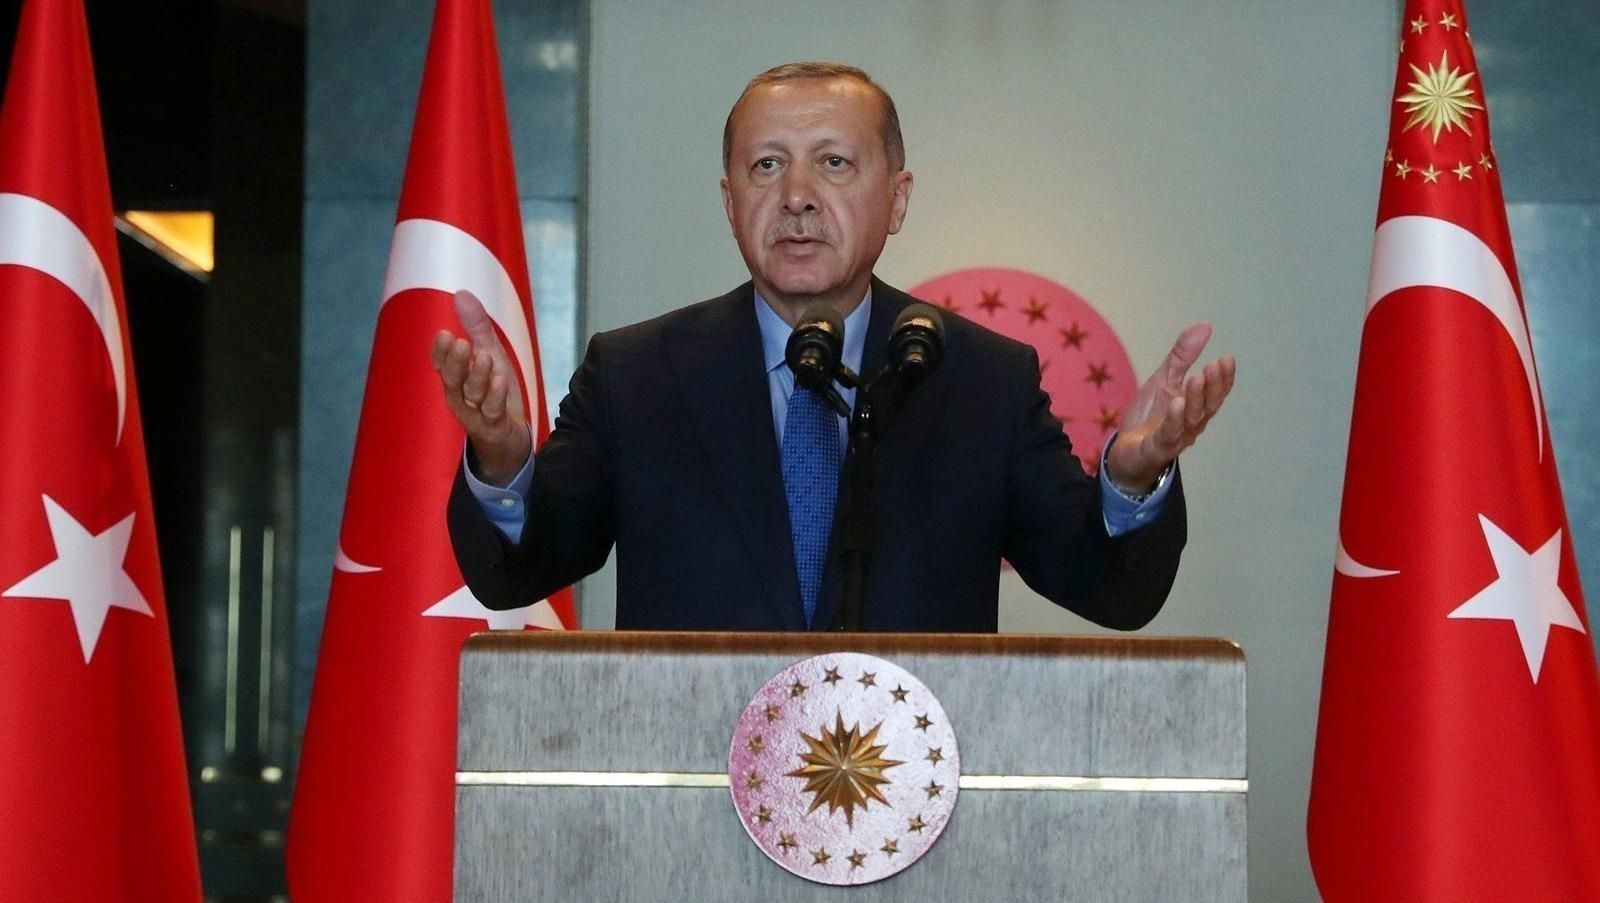 43fb5f_erdogan_speech_x974 Турк улс Iphone-ийг хориглоно